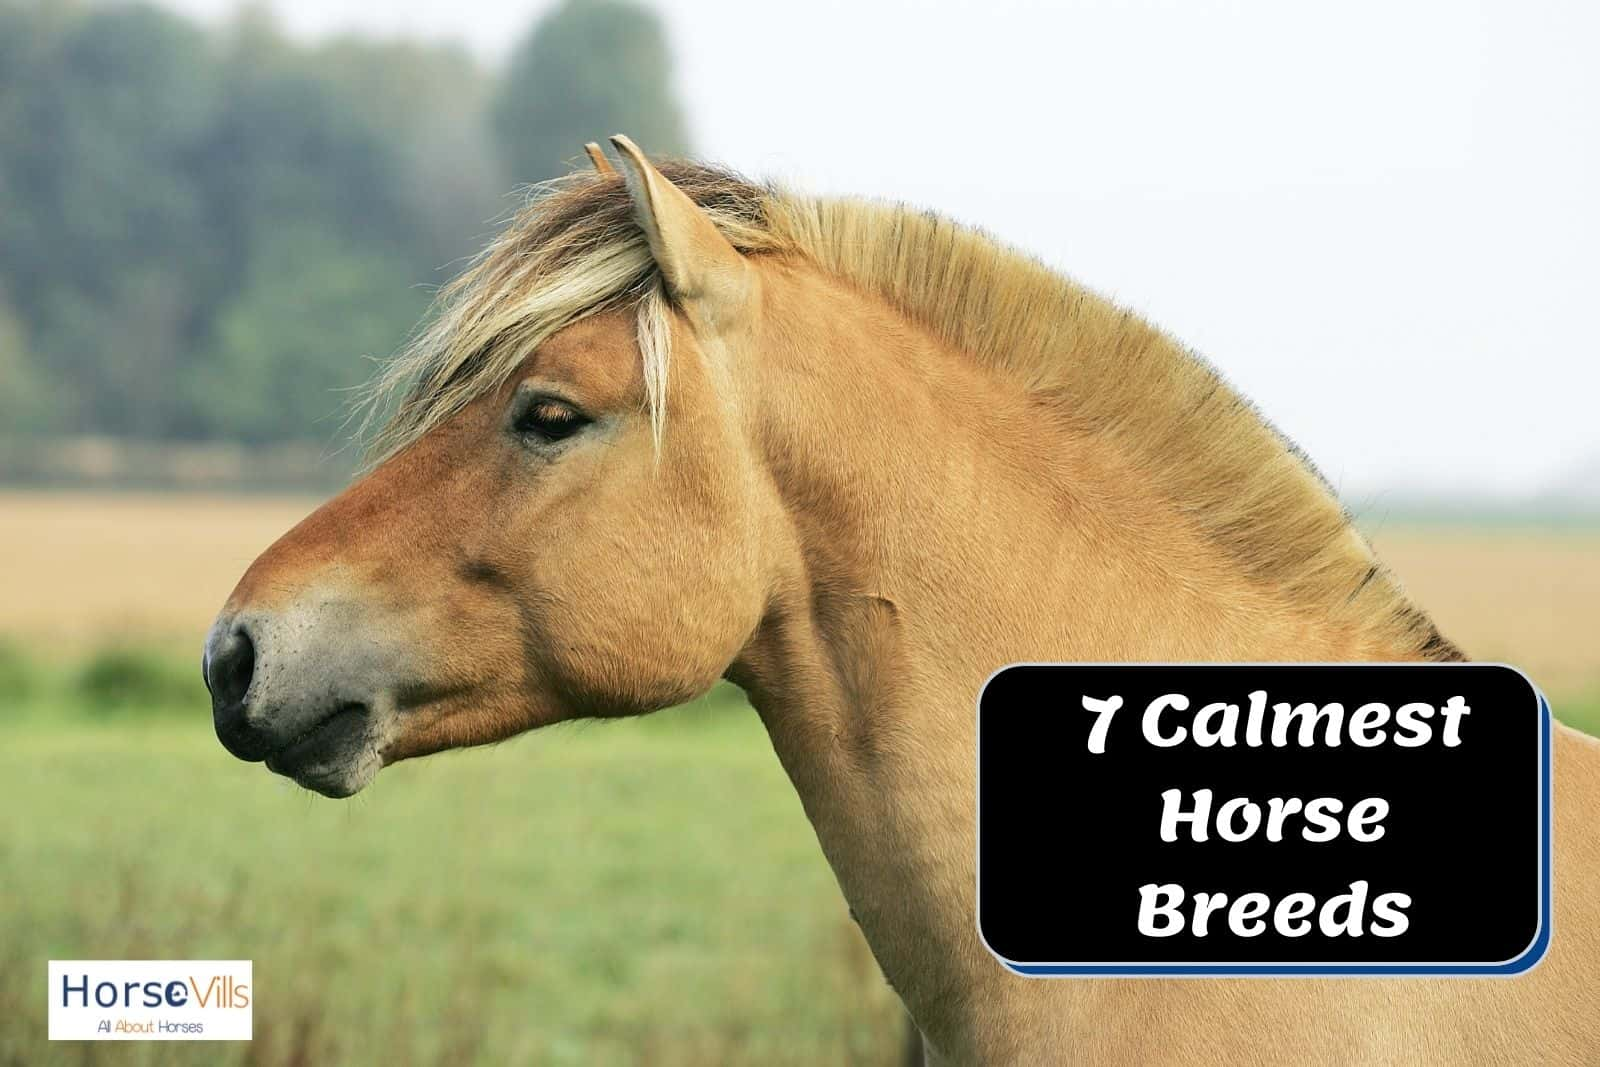 NORWEGIAN FJORD HORSES, one of the calmest horse breeds